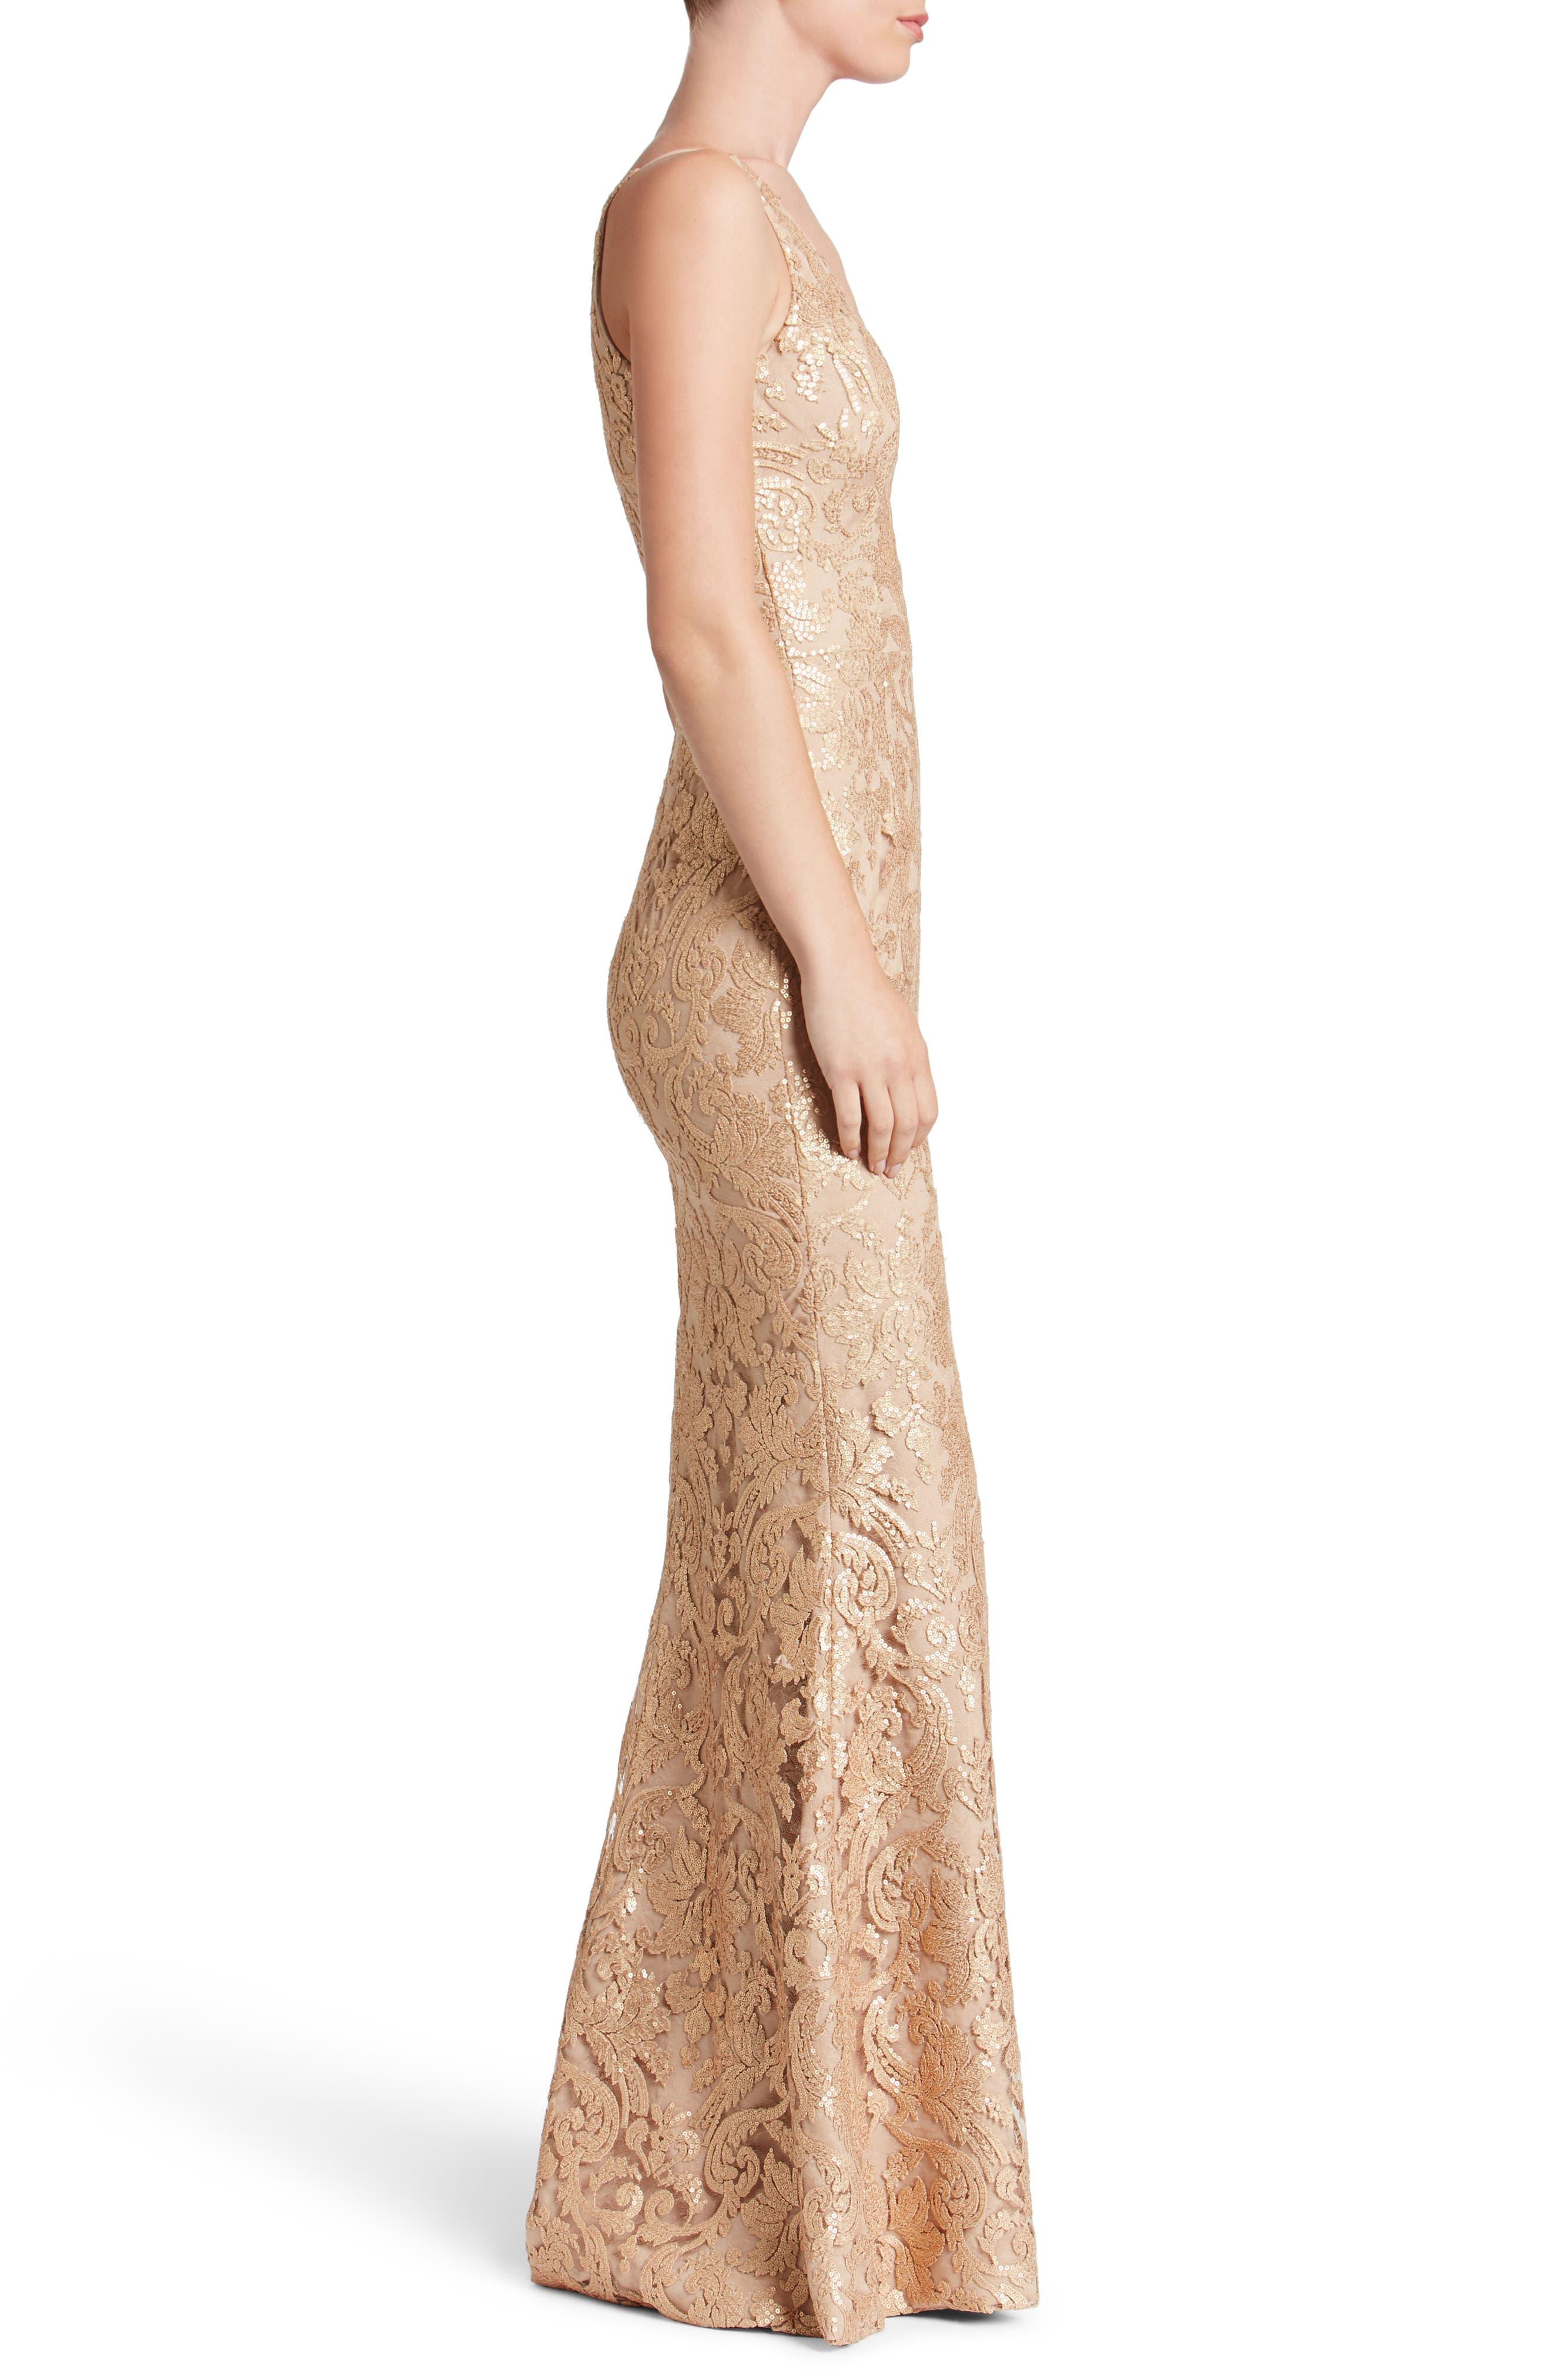 Karen Mermaid Gown,                             Alternate thumbnail 17, color,